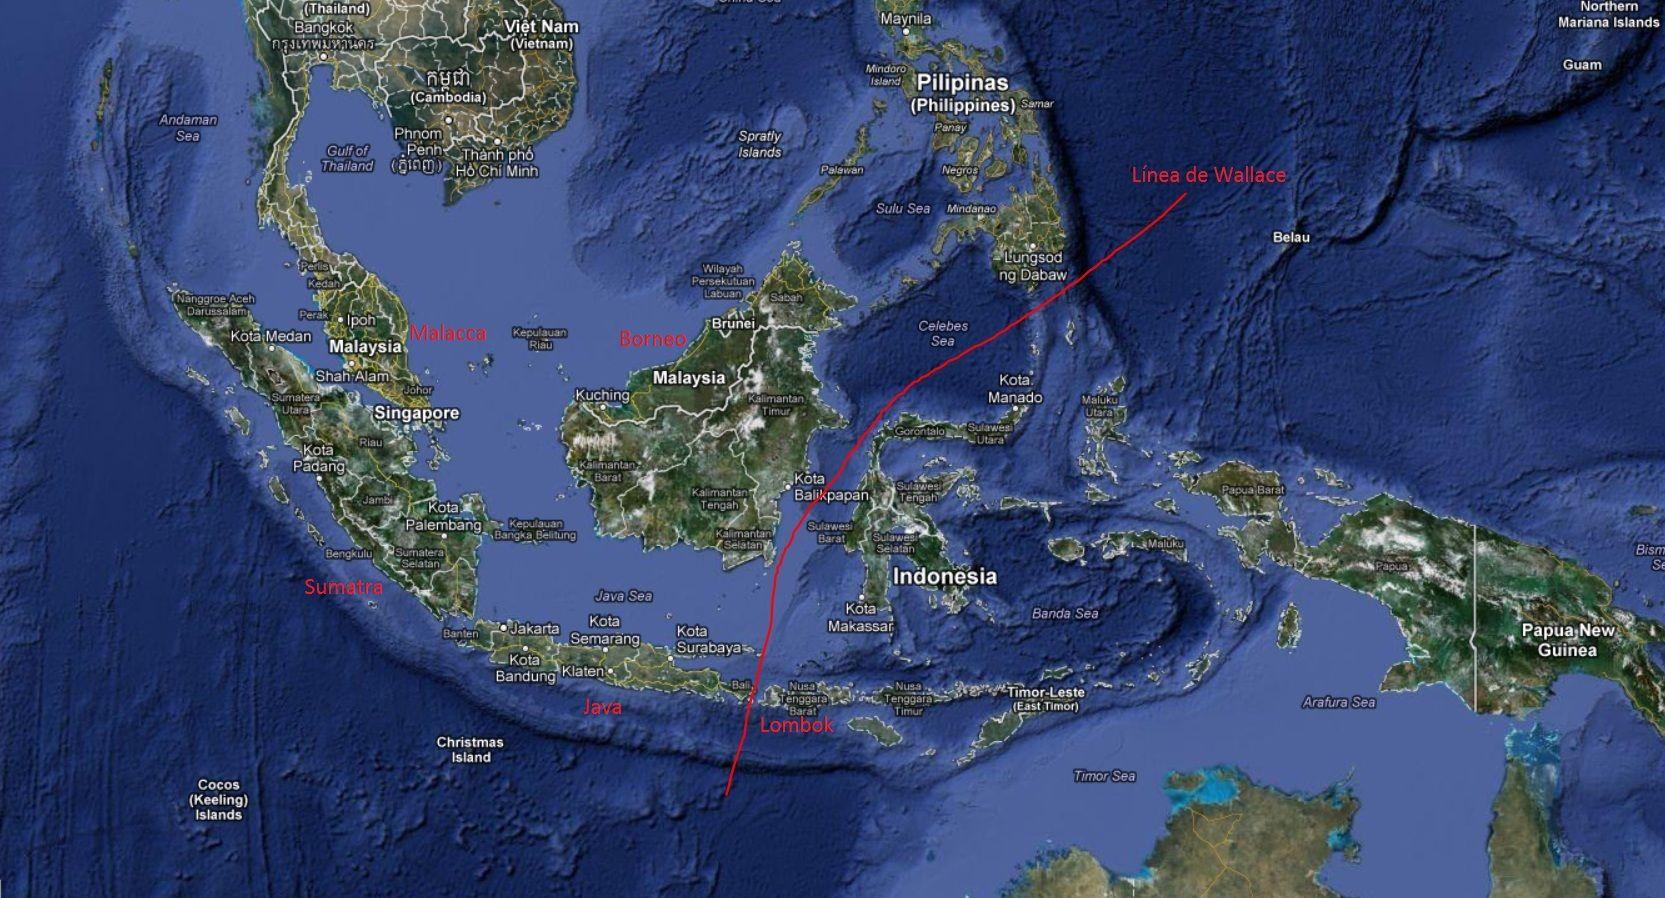 archipielago malayo 1